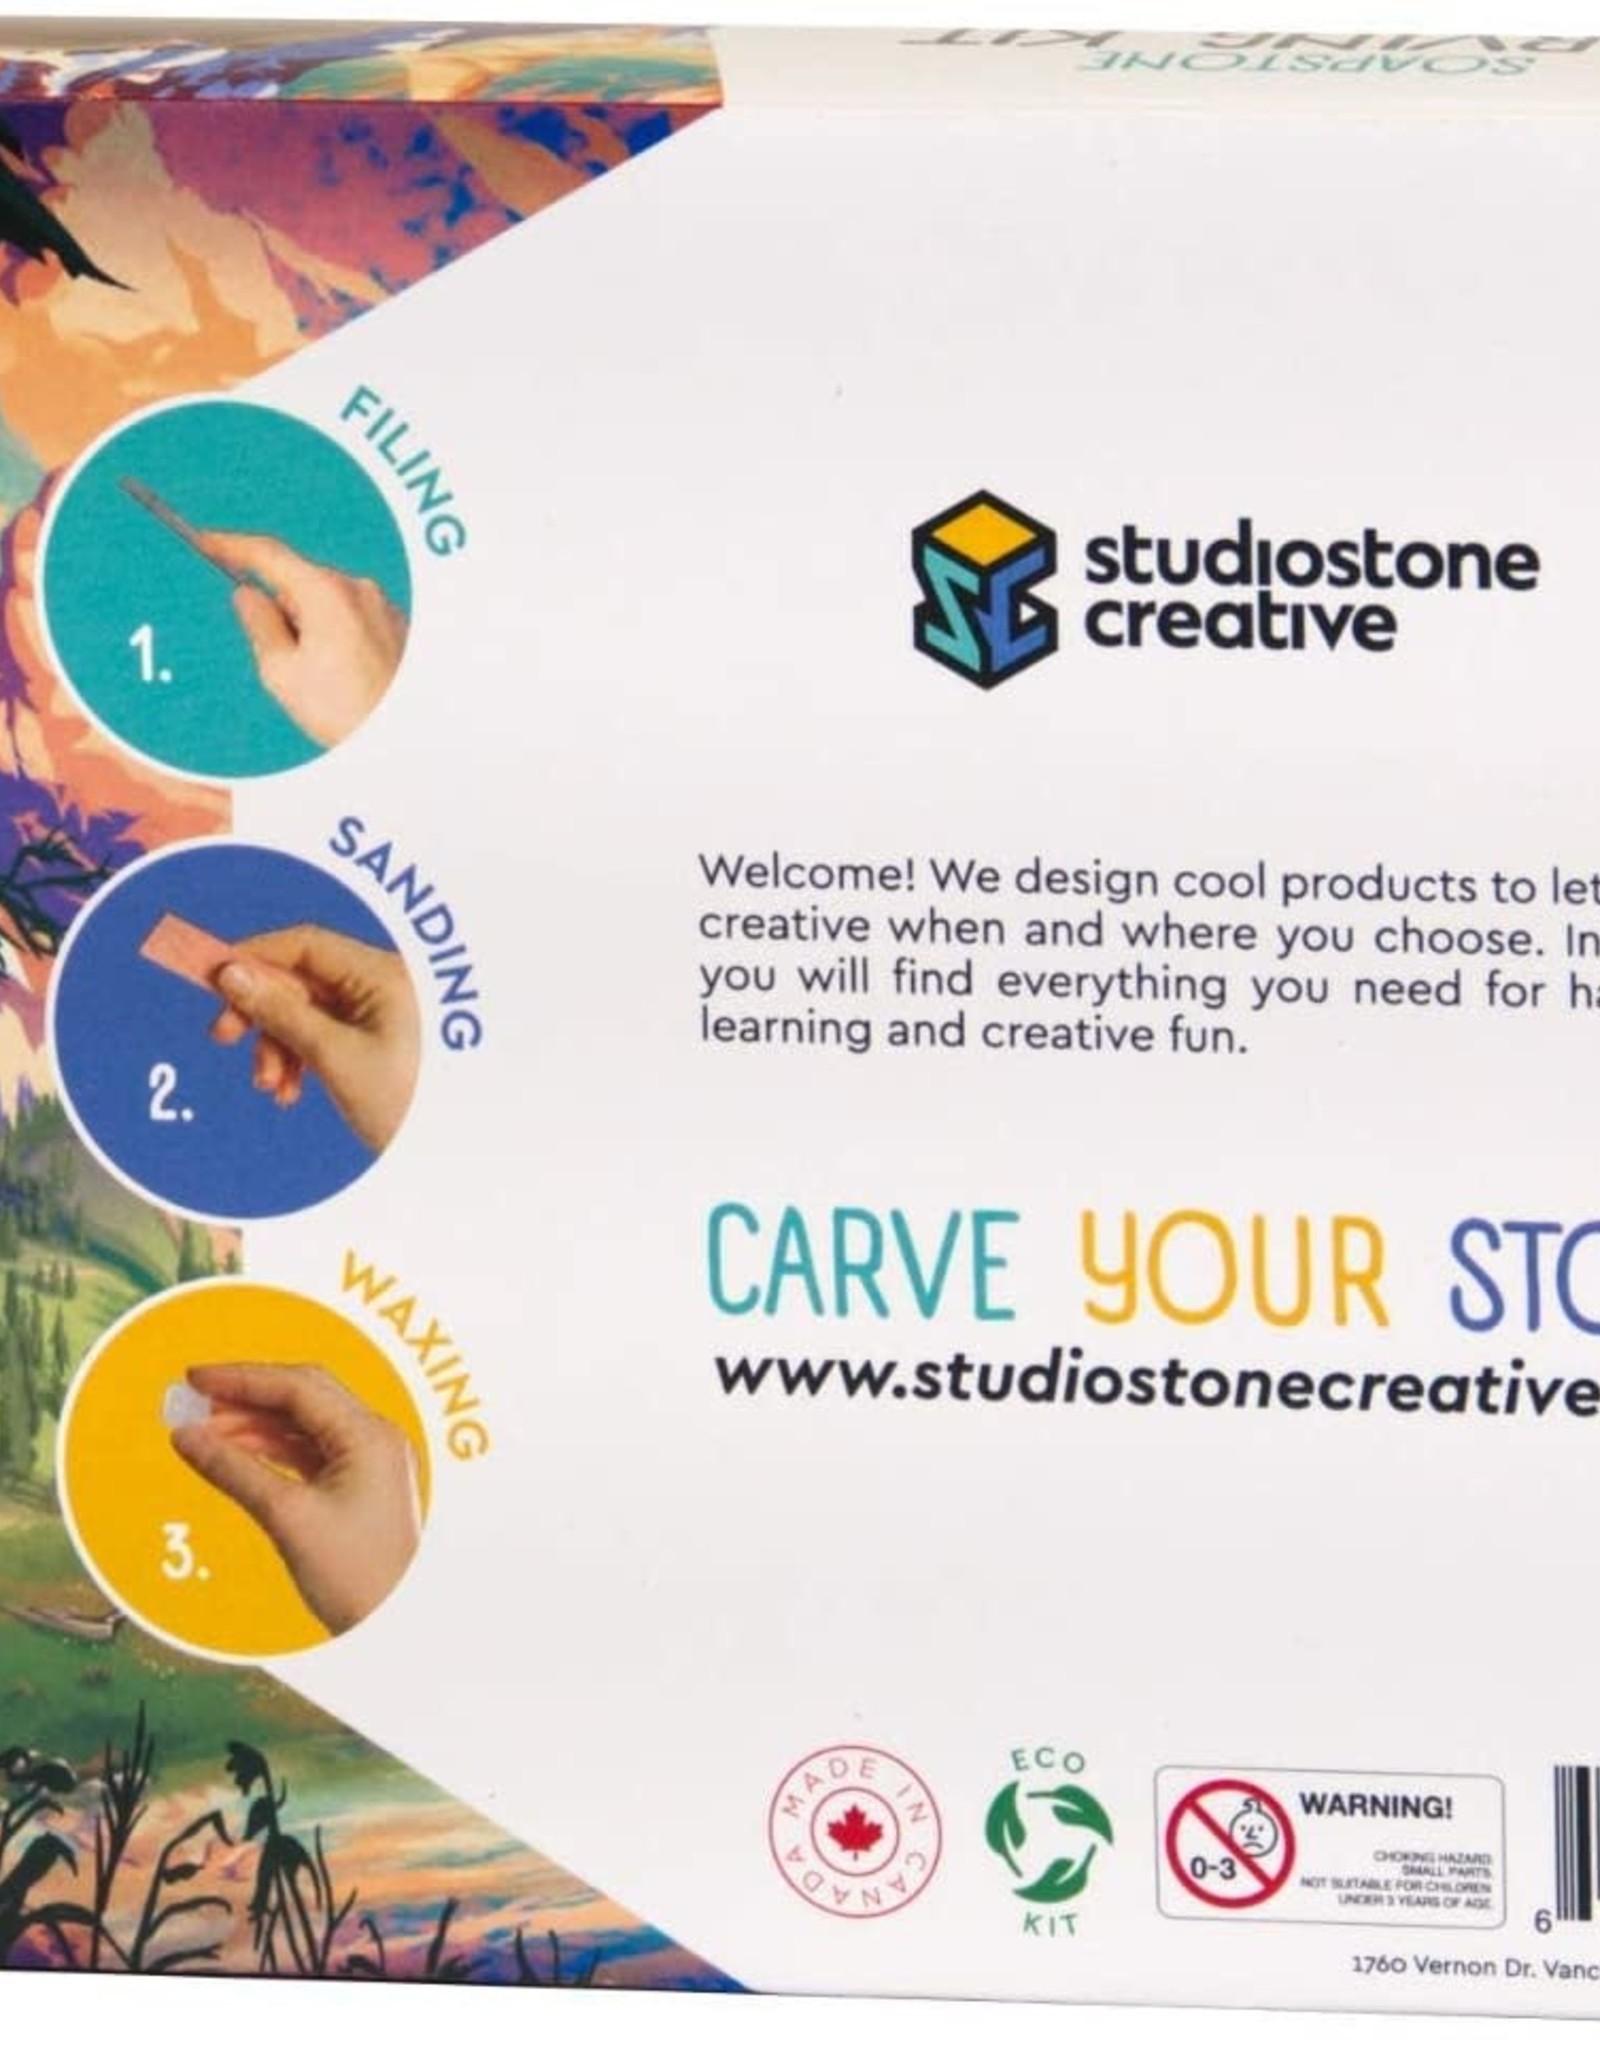 Studiostone Creative Soapstone Carving Kit Wolf